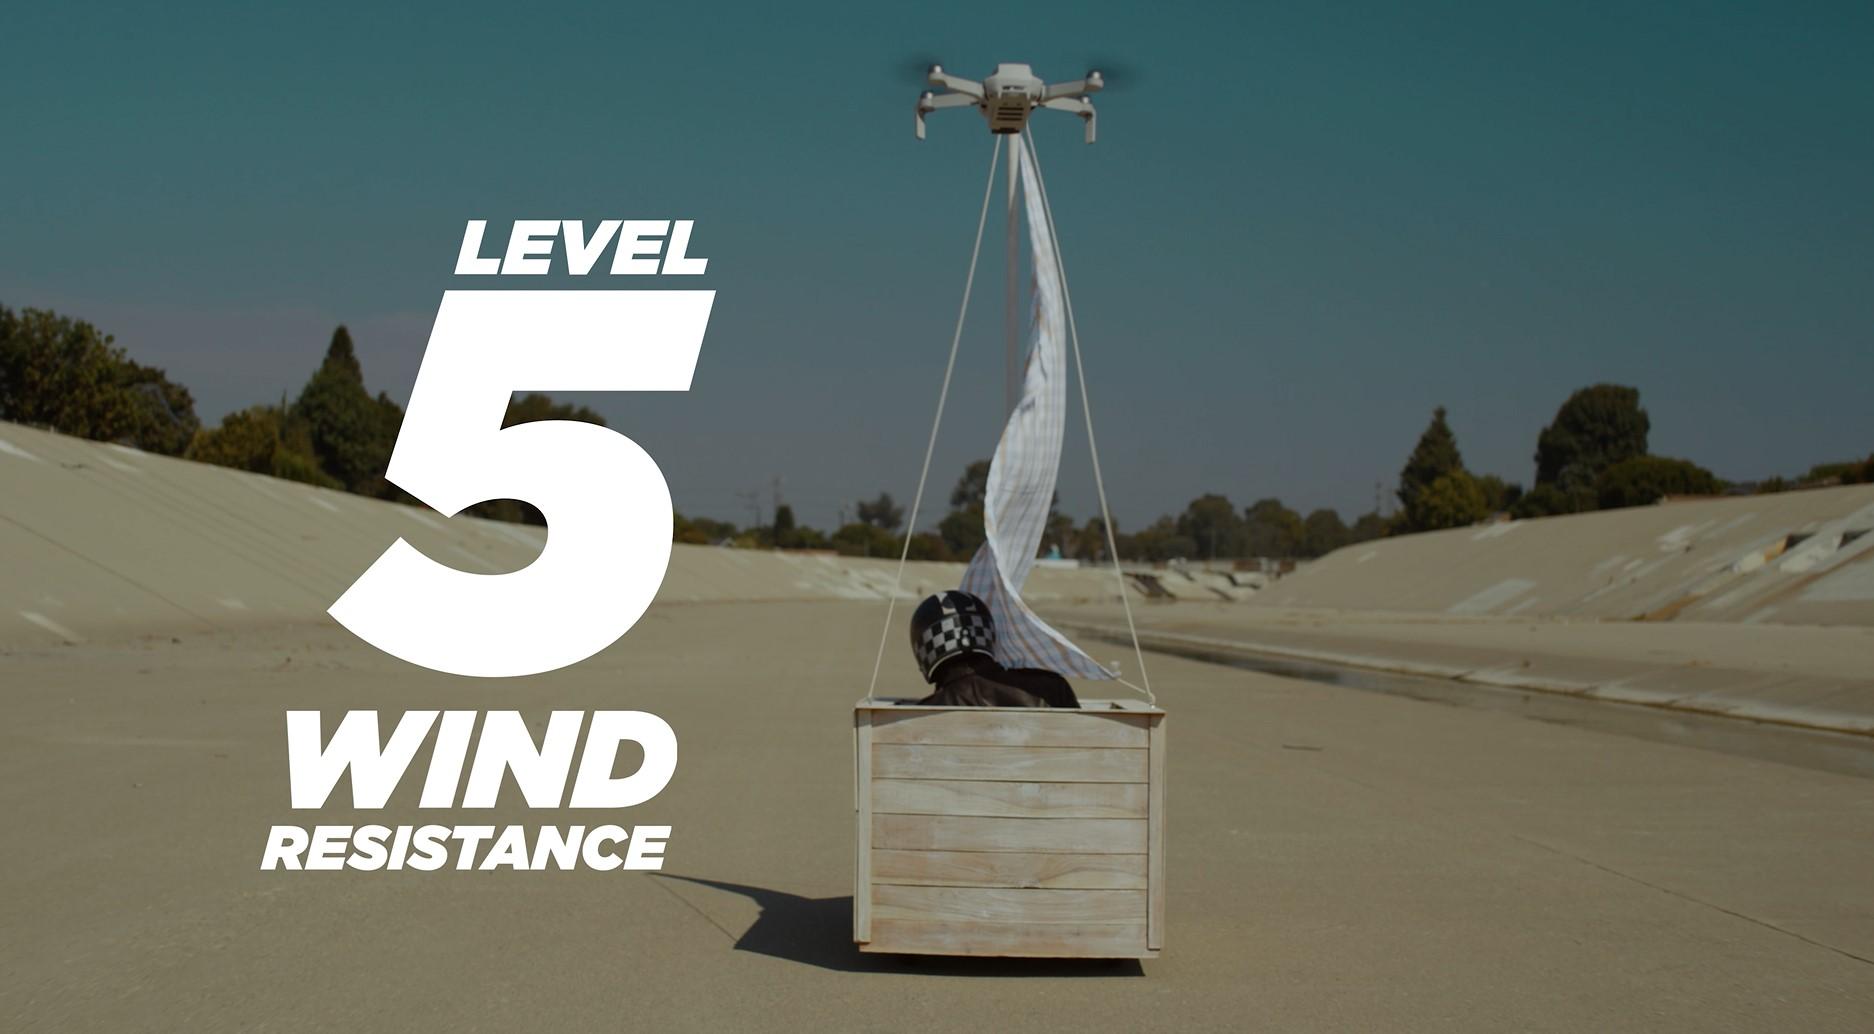 DJI Mini 2 drone wind-resistance